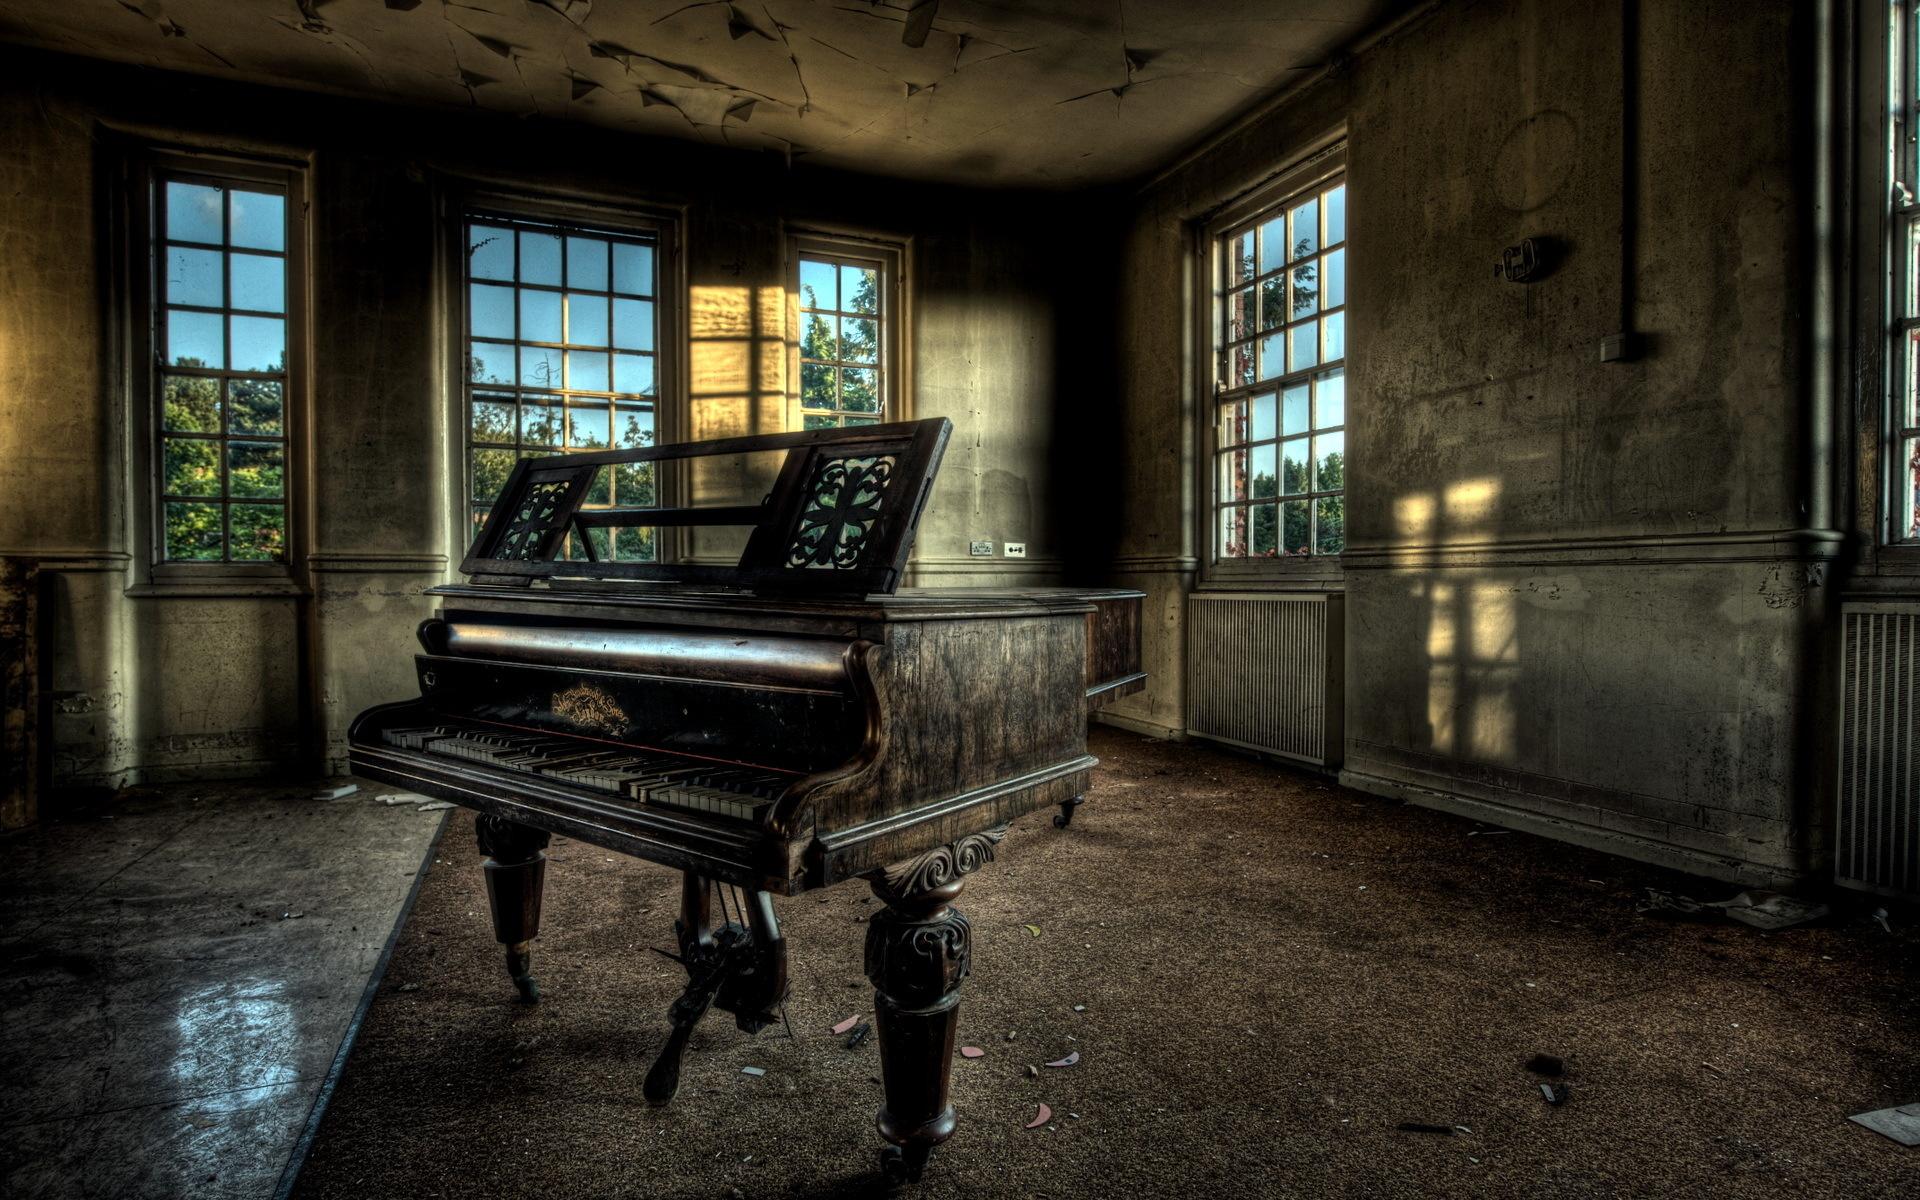 Vintage piano desktop hd wallpaper 58720 1920x1200 px for Piani casa africani gratis